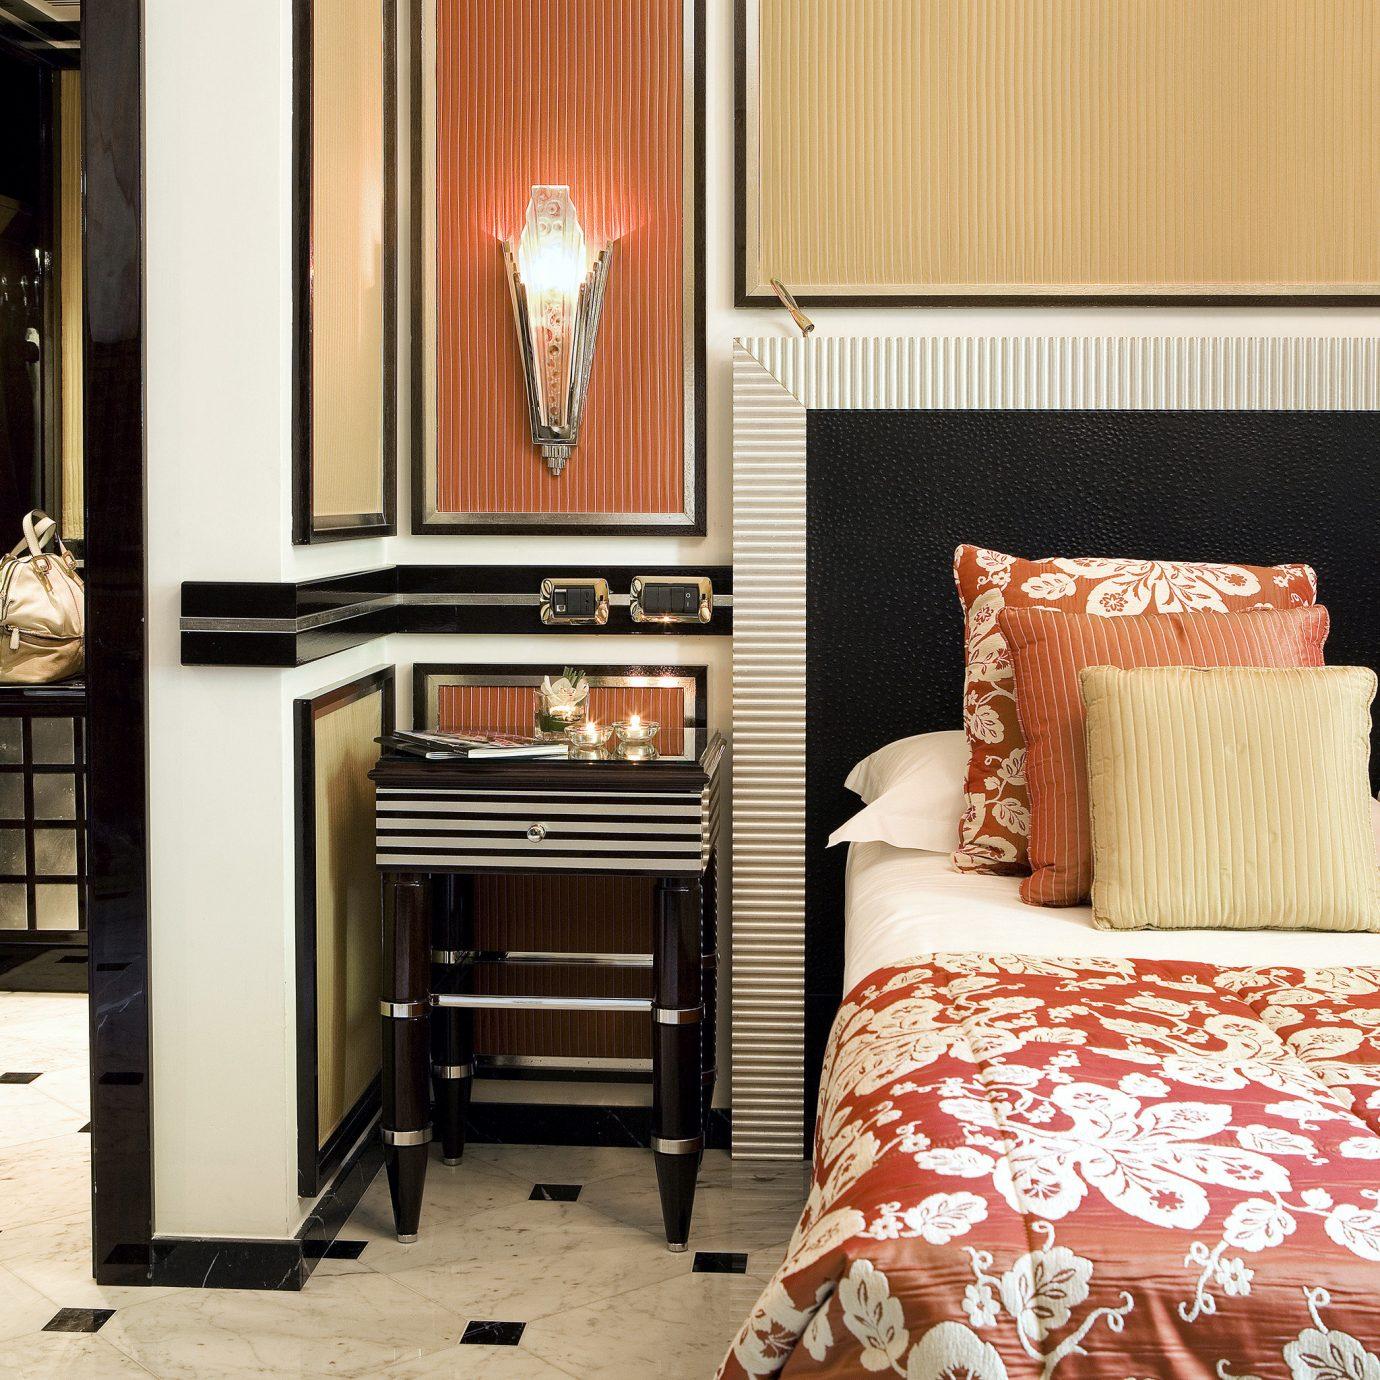 Bedroom City Classic Elegant Luxury Suite property home hardwood living room bed sheet cottage flooring textile